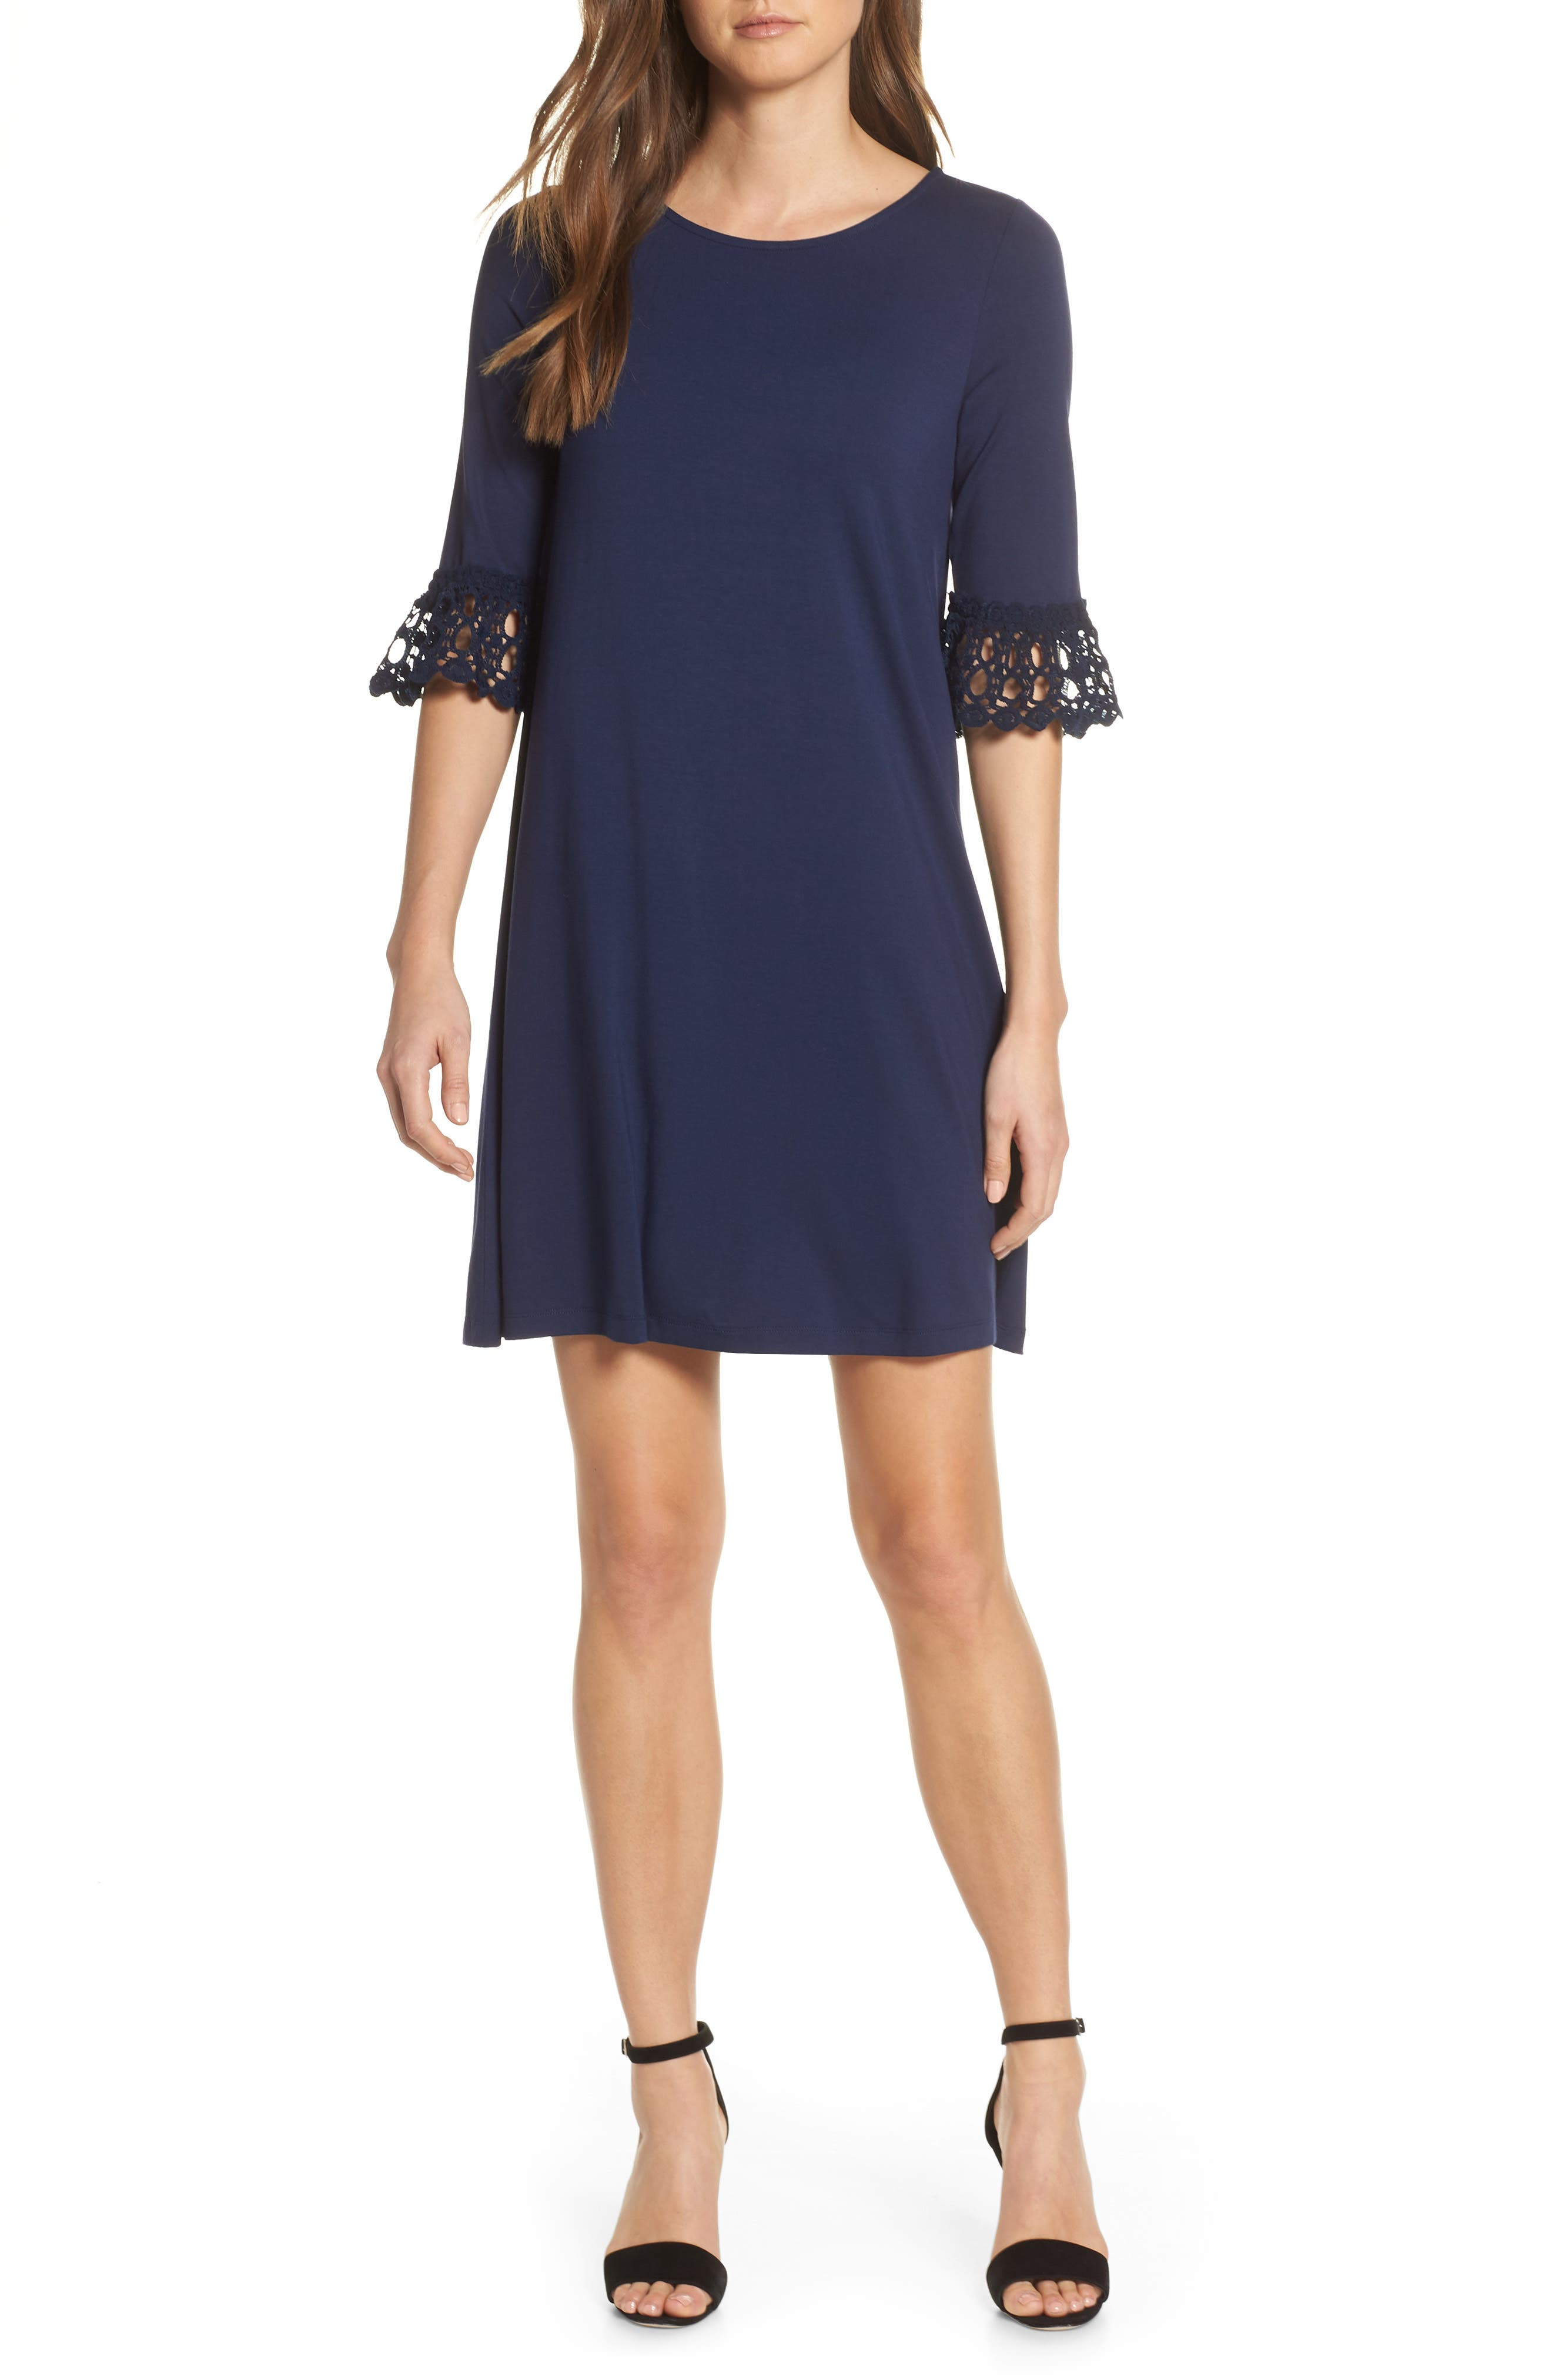 Lilly Pulitzer Ophelia Crochet Cuff Shift Dress, Blue